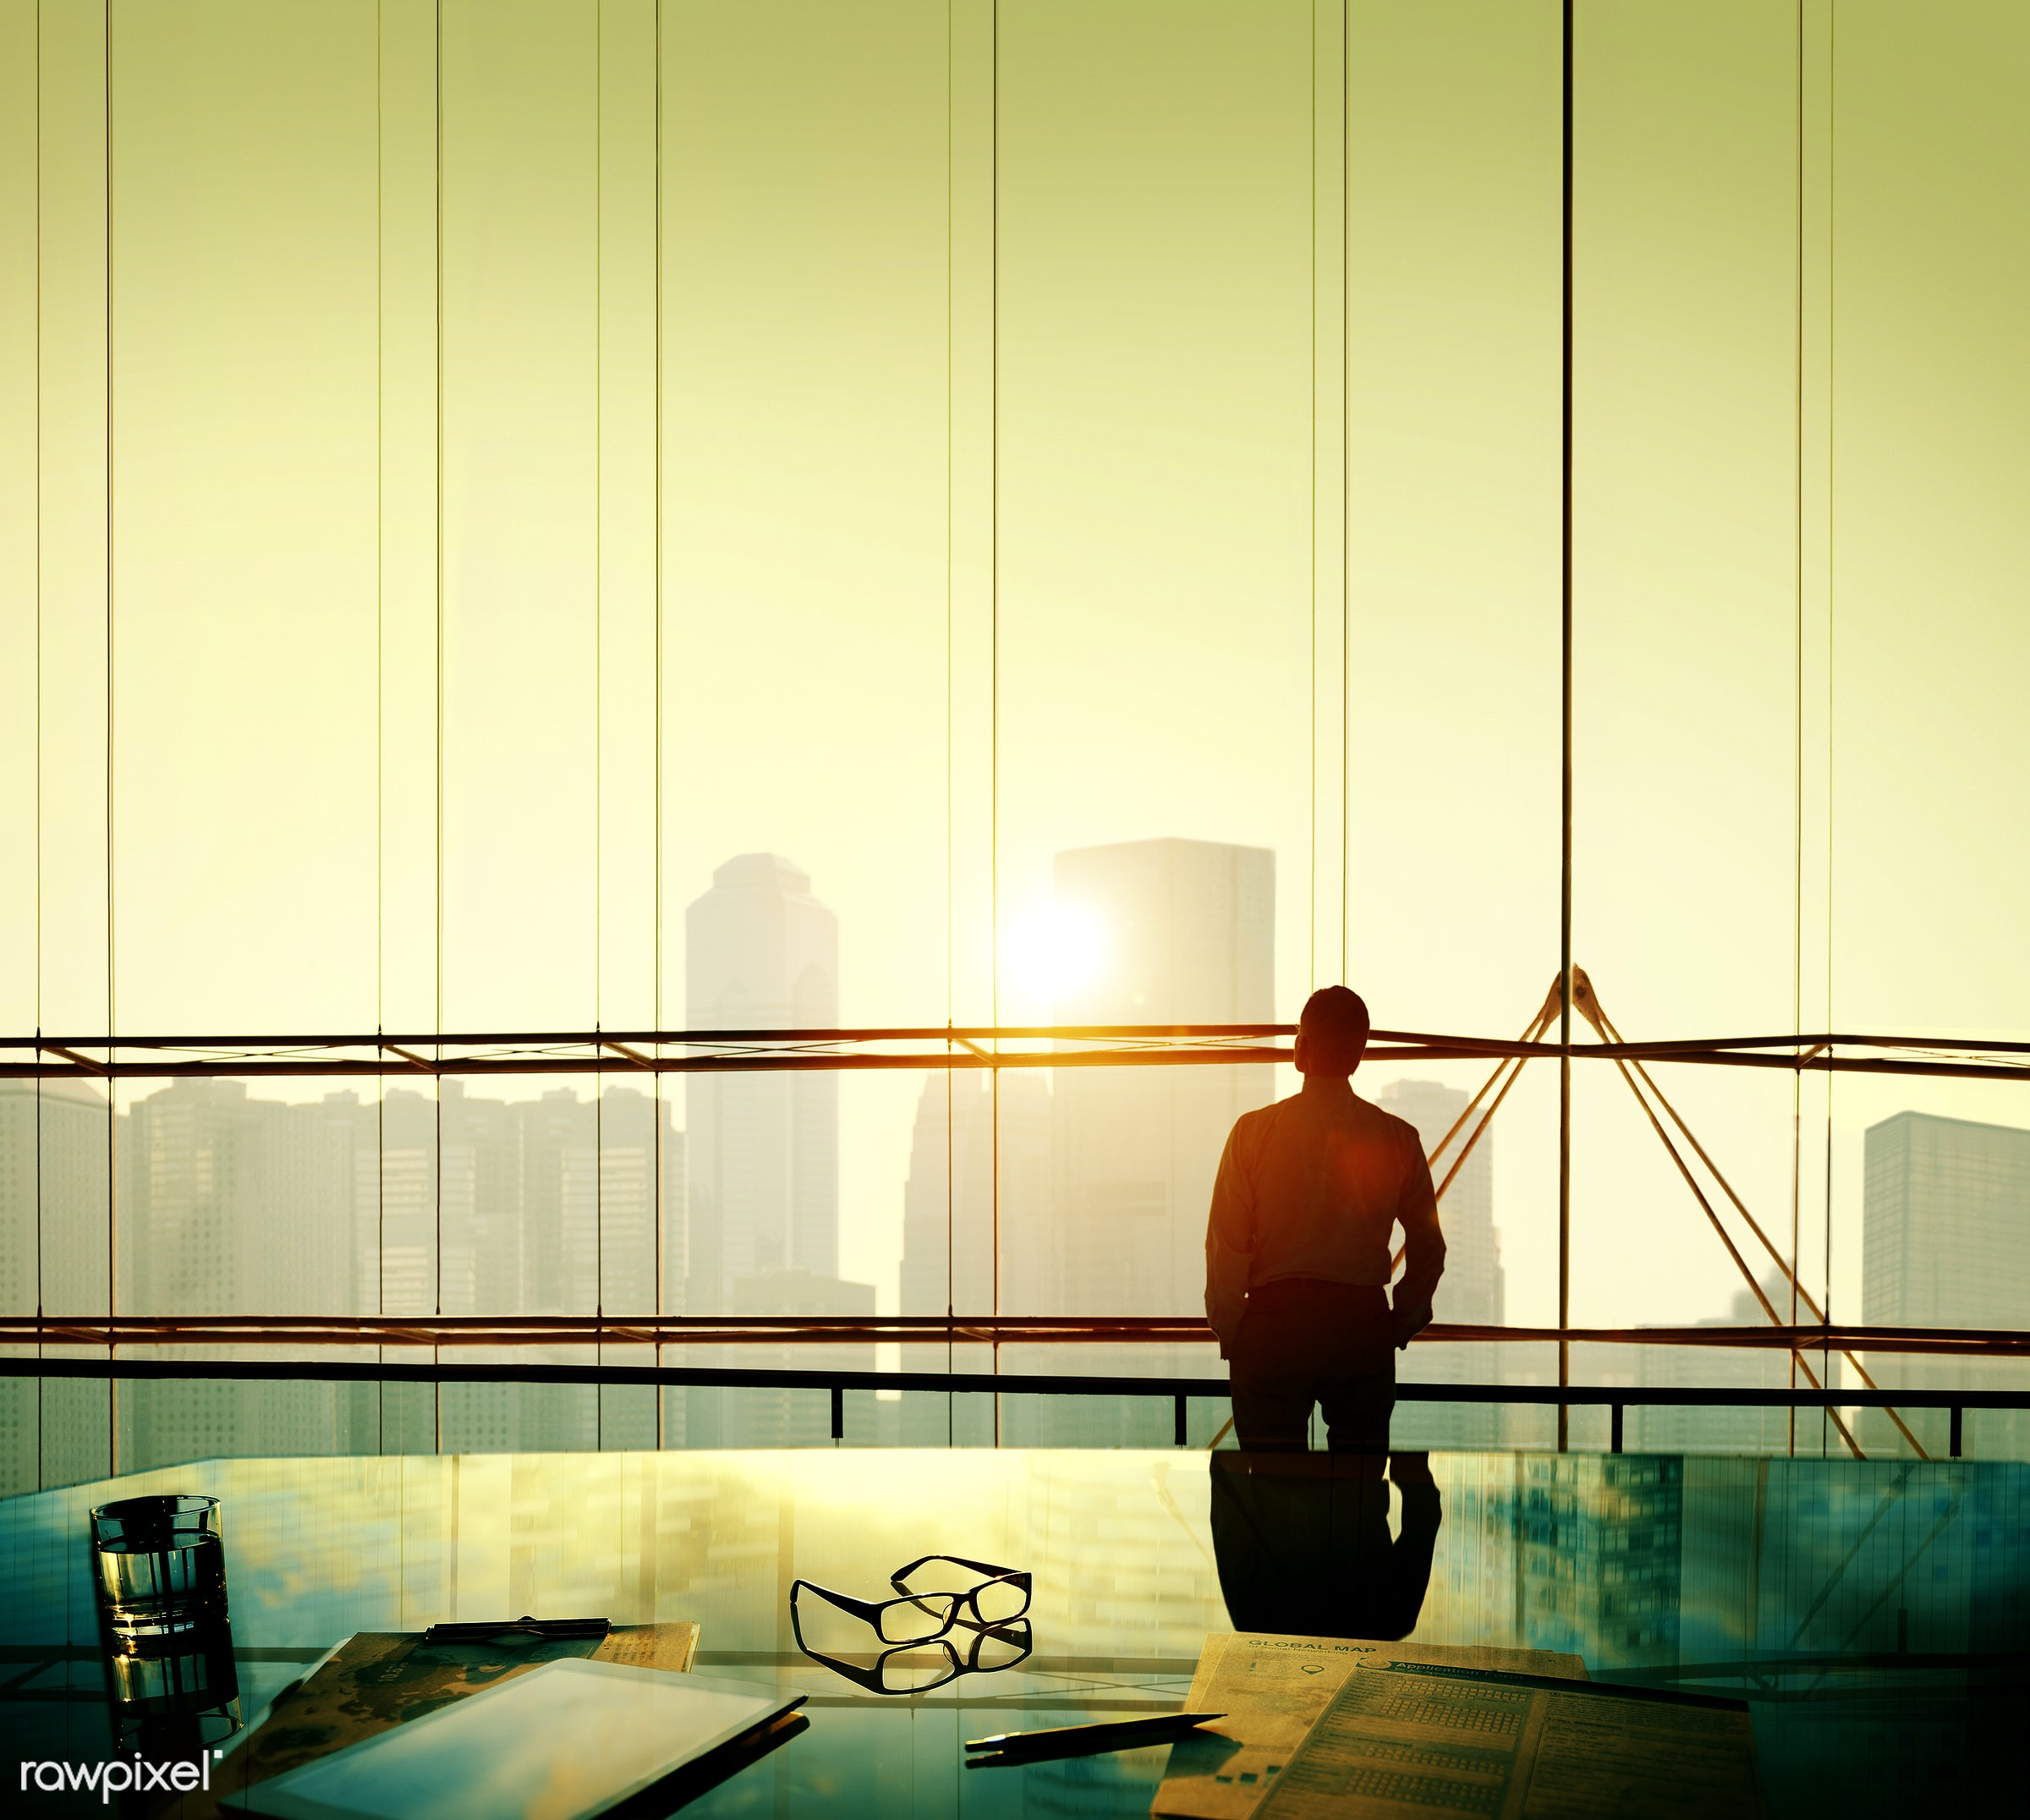 alone, aspiration, backlit, boss, building, business, businessman, city, cityscape, contemplating, contemplation, day...